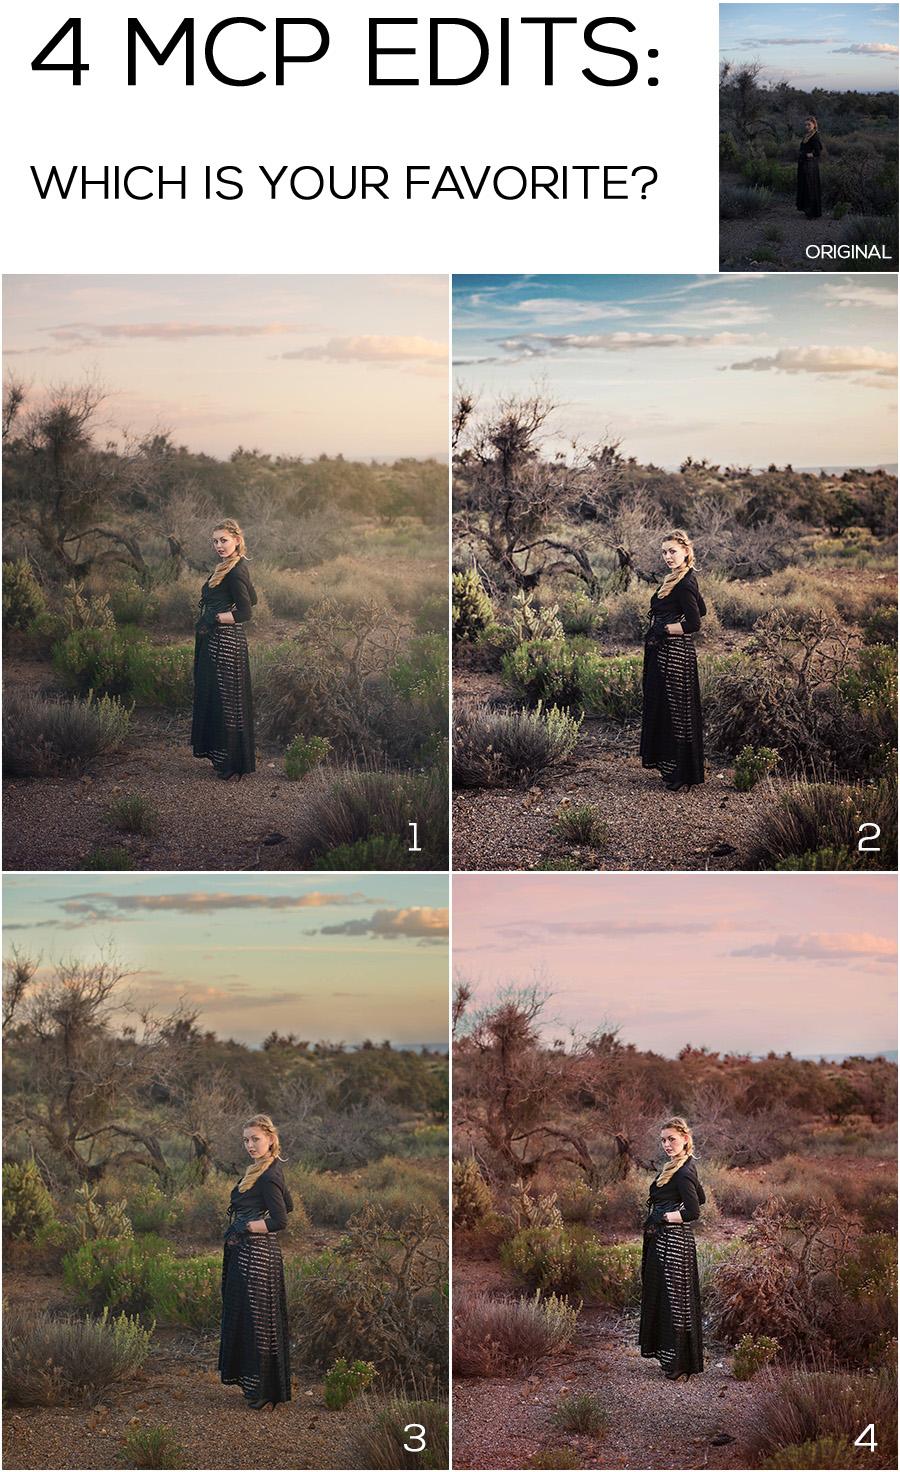 Linda-Fisher-Ypulong-edits MCP My Photo: How 4 Photographers Edit the Same Image Lightroom Presets Lightroom Tutorials Photoshop Actions Photoshop Tips & Tutorials